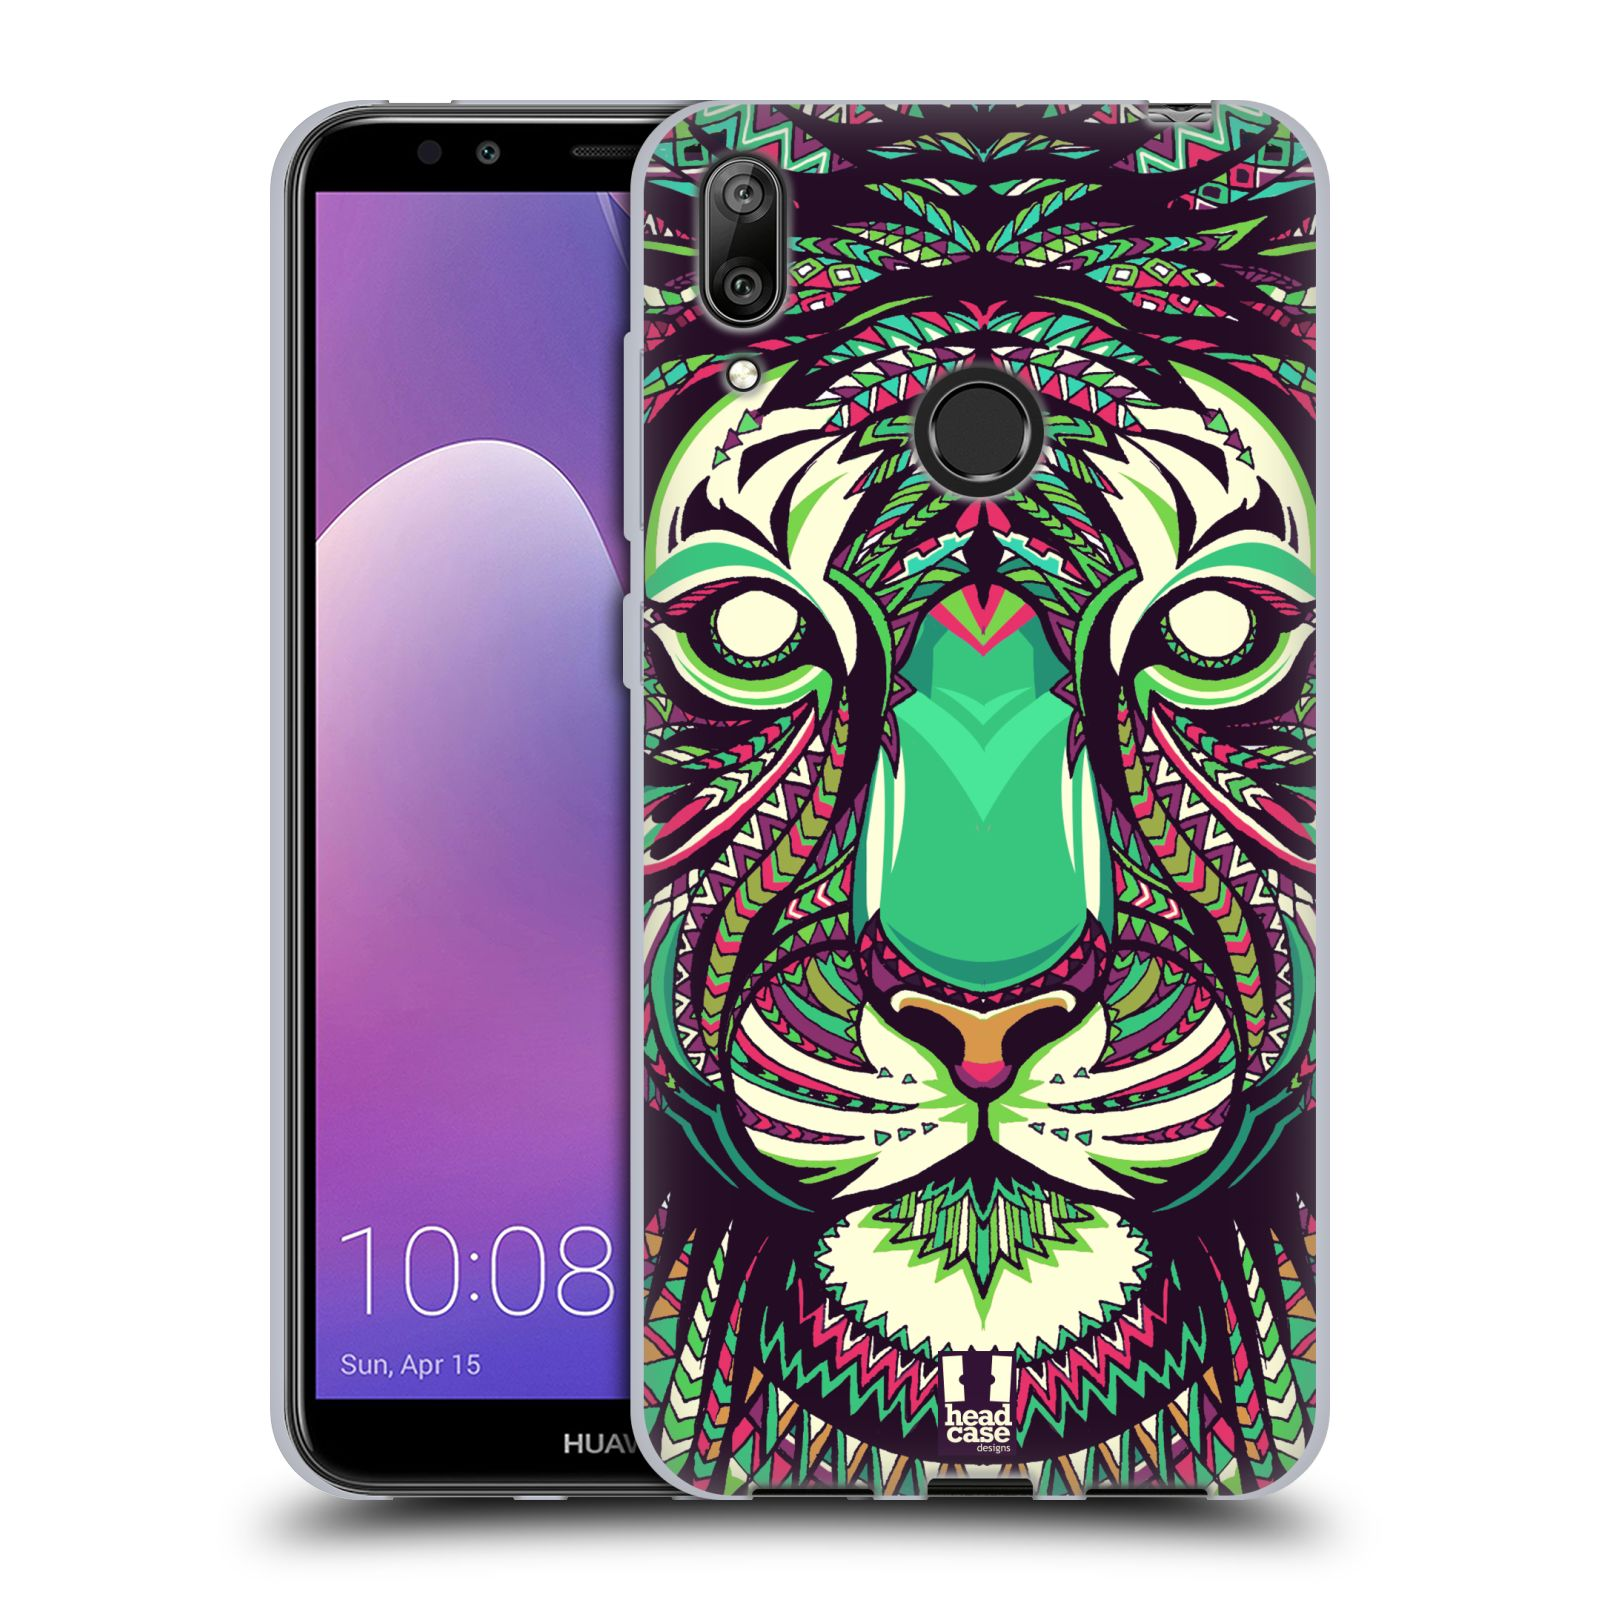 Silikonové pouzdro na mobil Huawei Y7 (2019) - Head Case - AZTEC TYGR